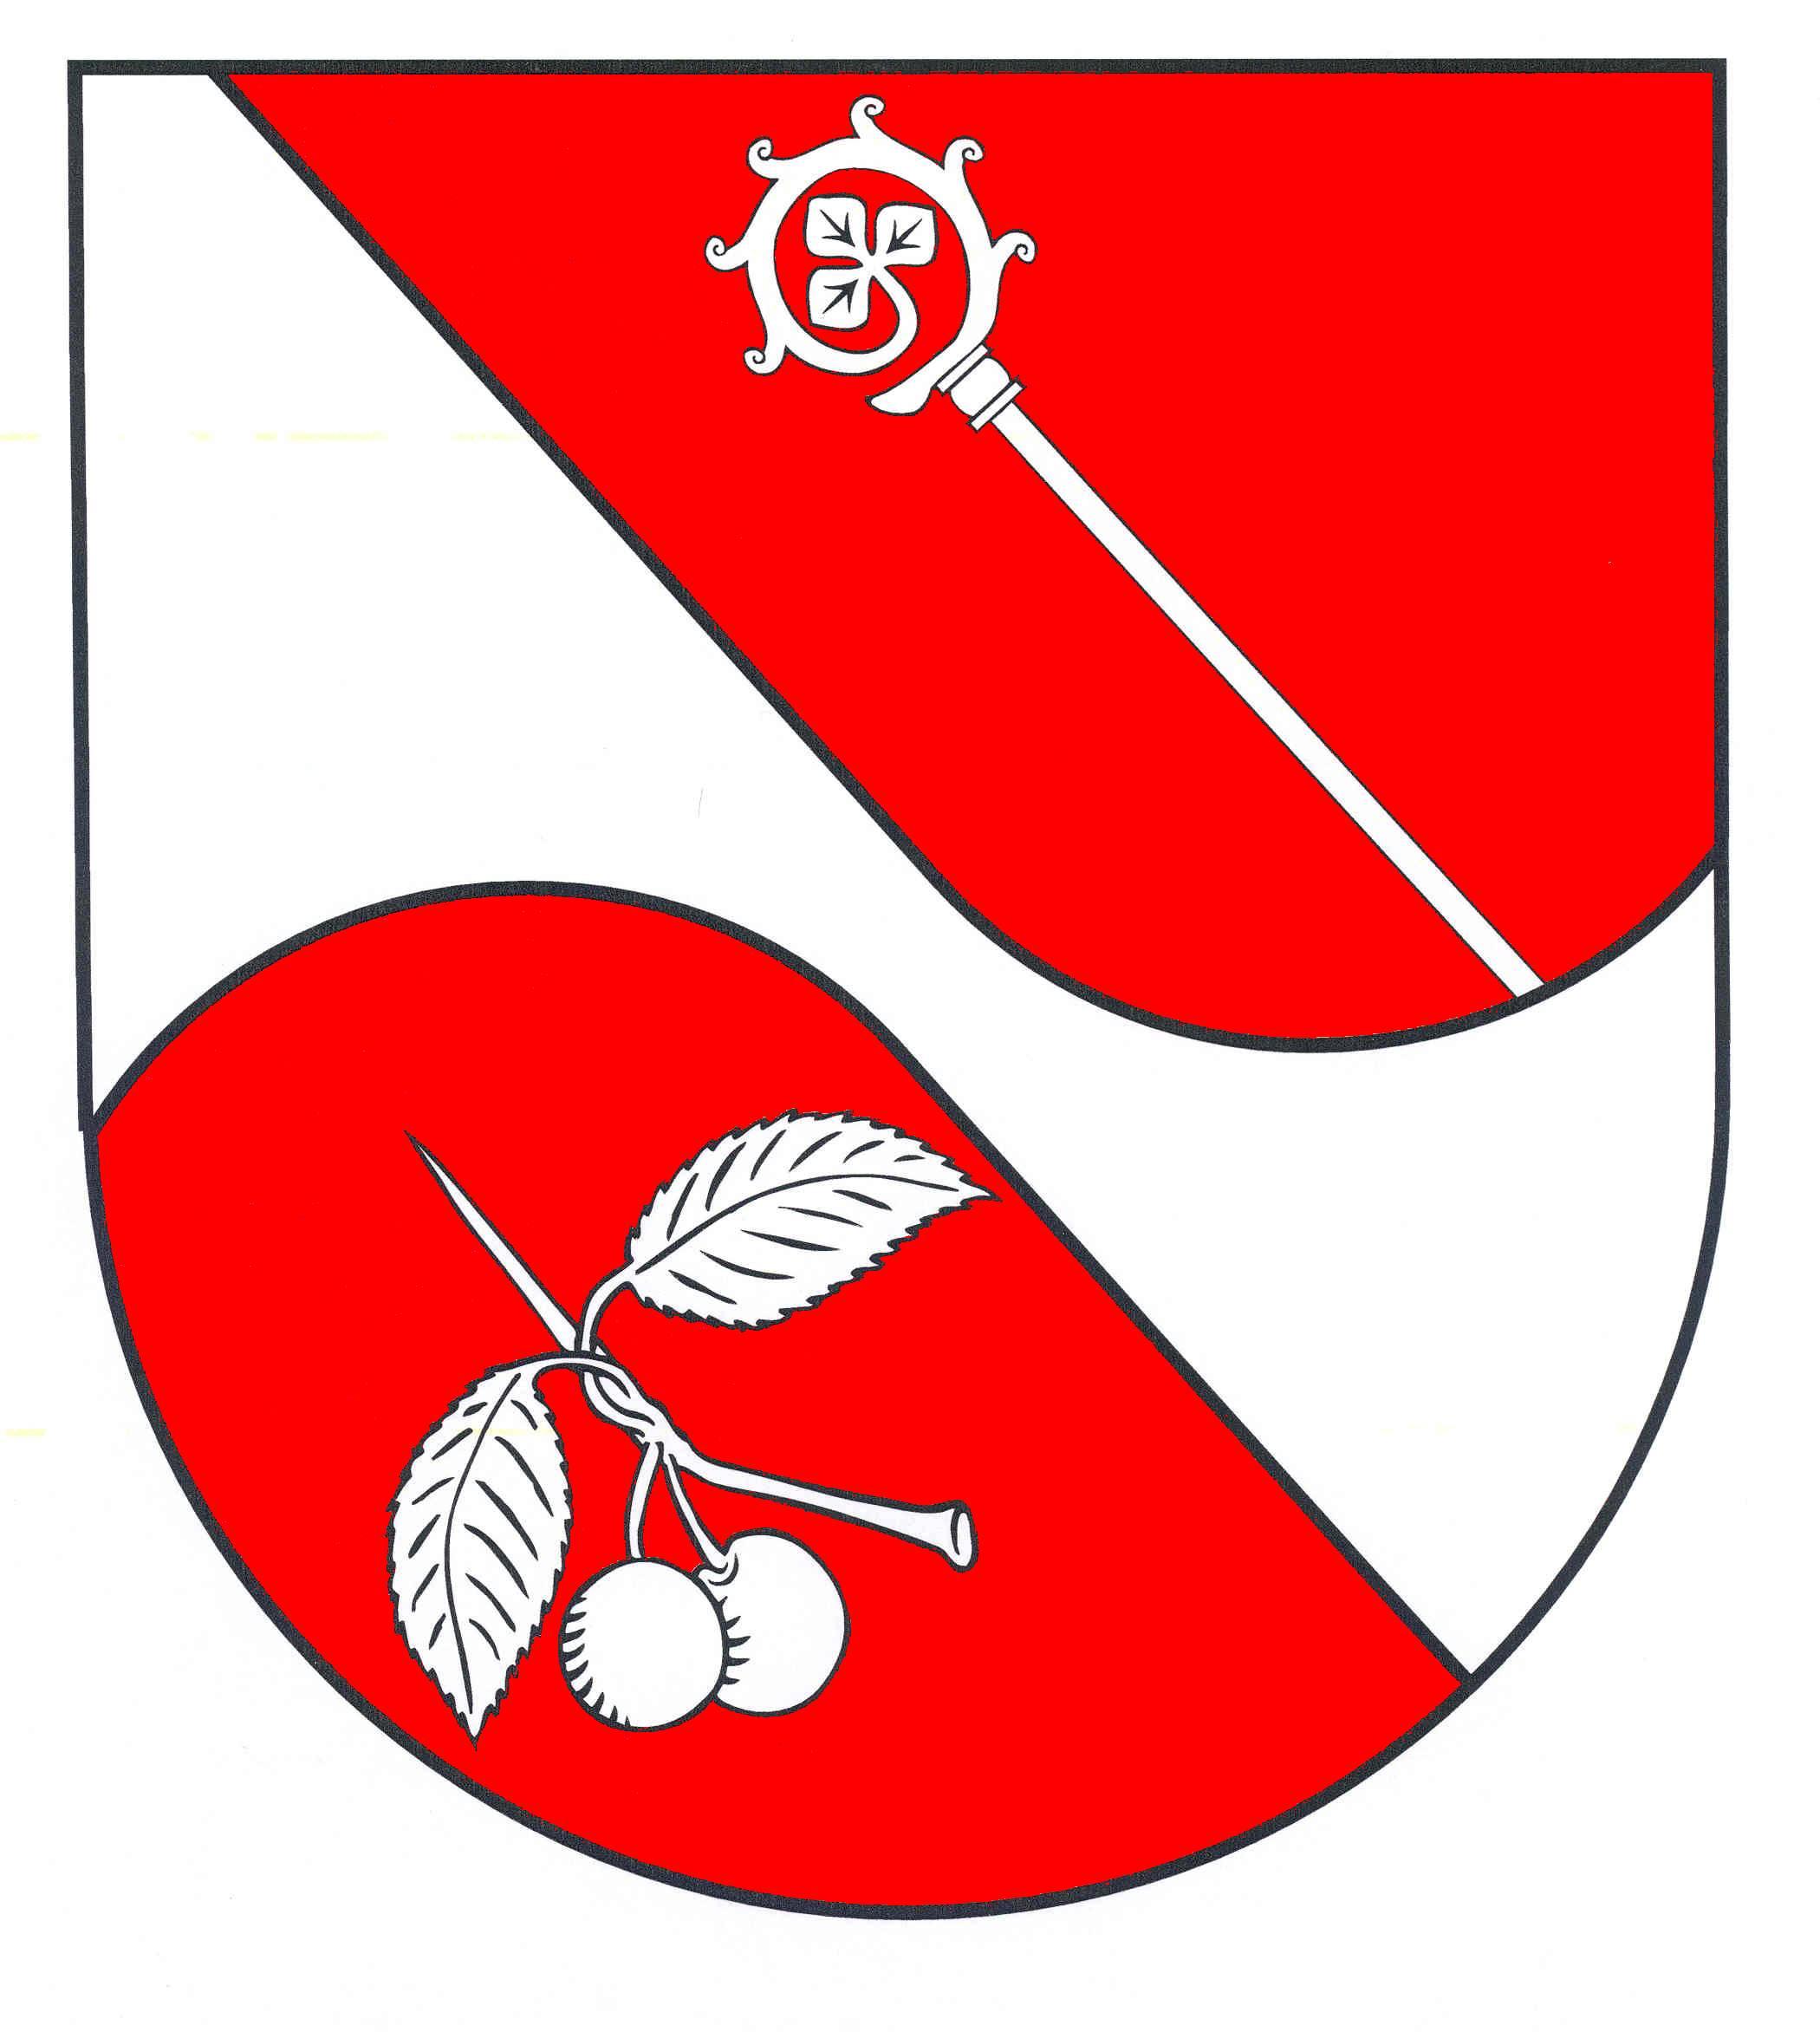 Wappen GemeindeMönkhagen, Kreis Stormarn